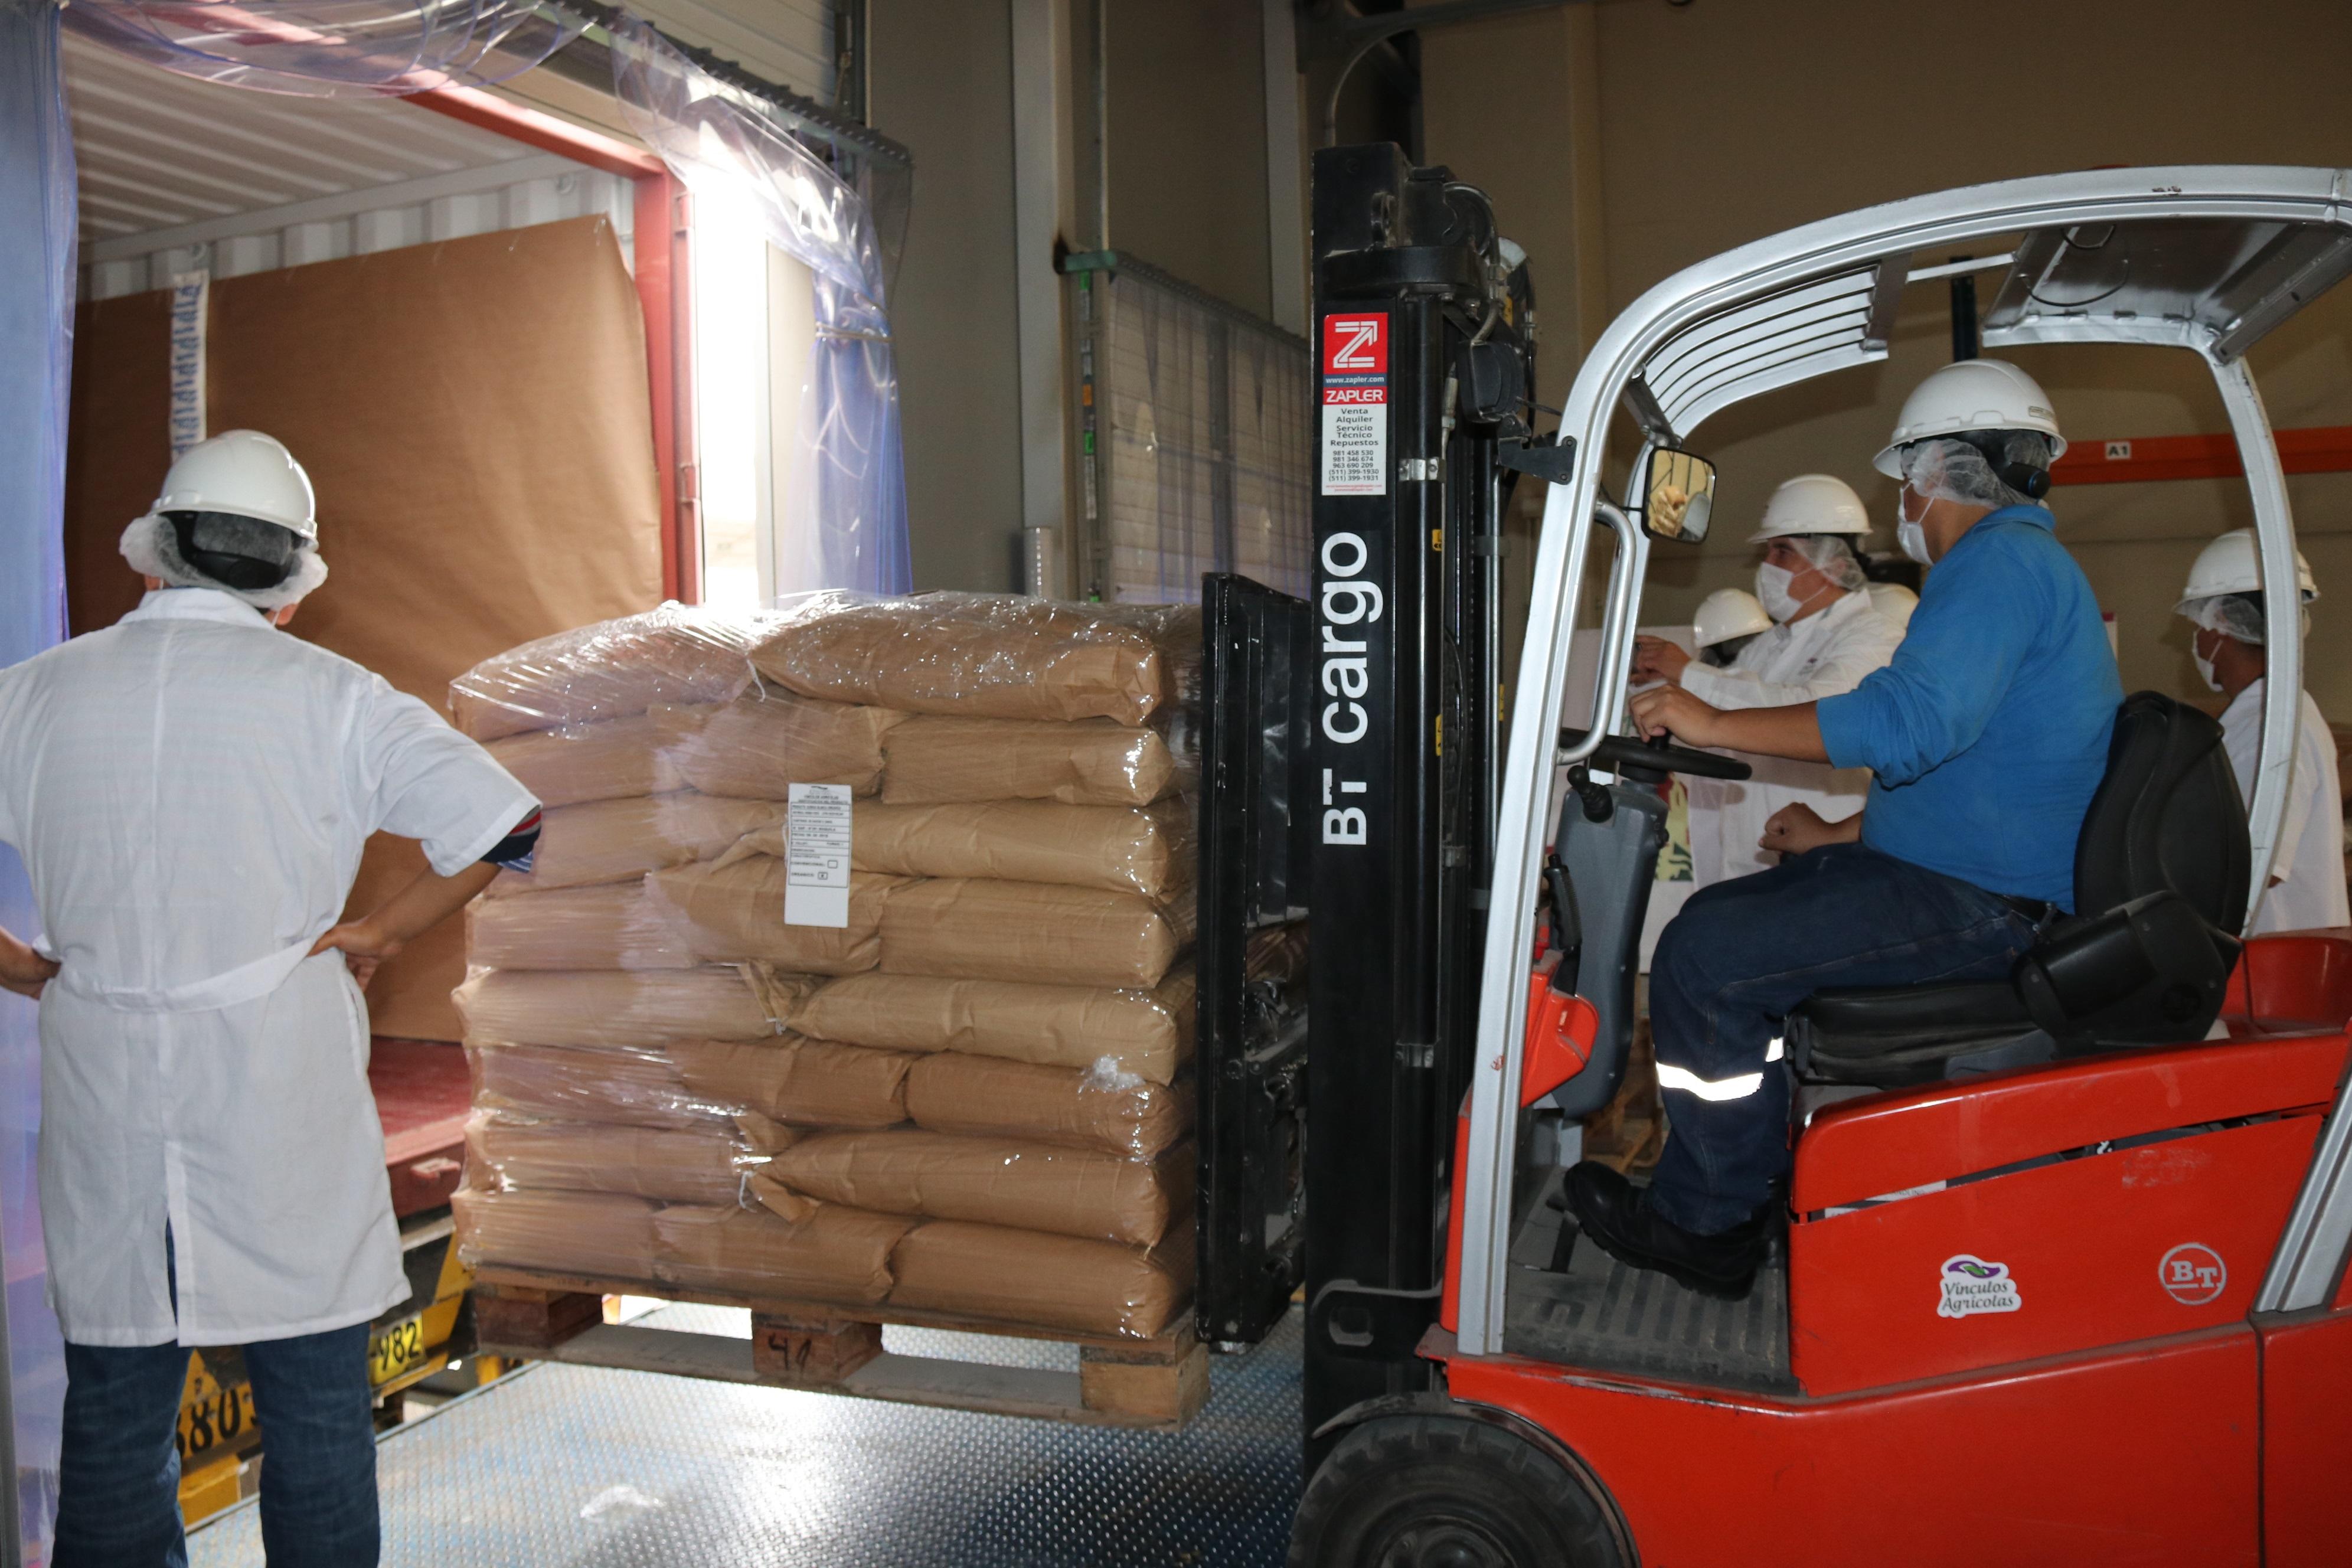 Productores de quinua orgánica de la sierra liberteña exportan por primera vez a Francia